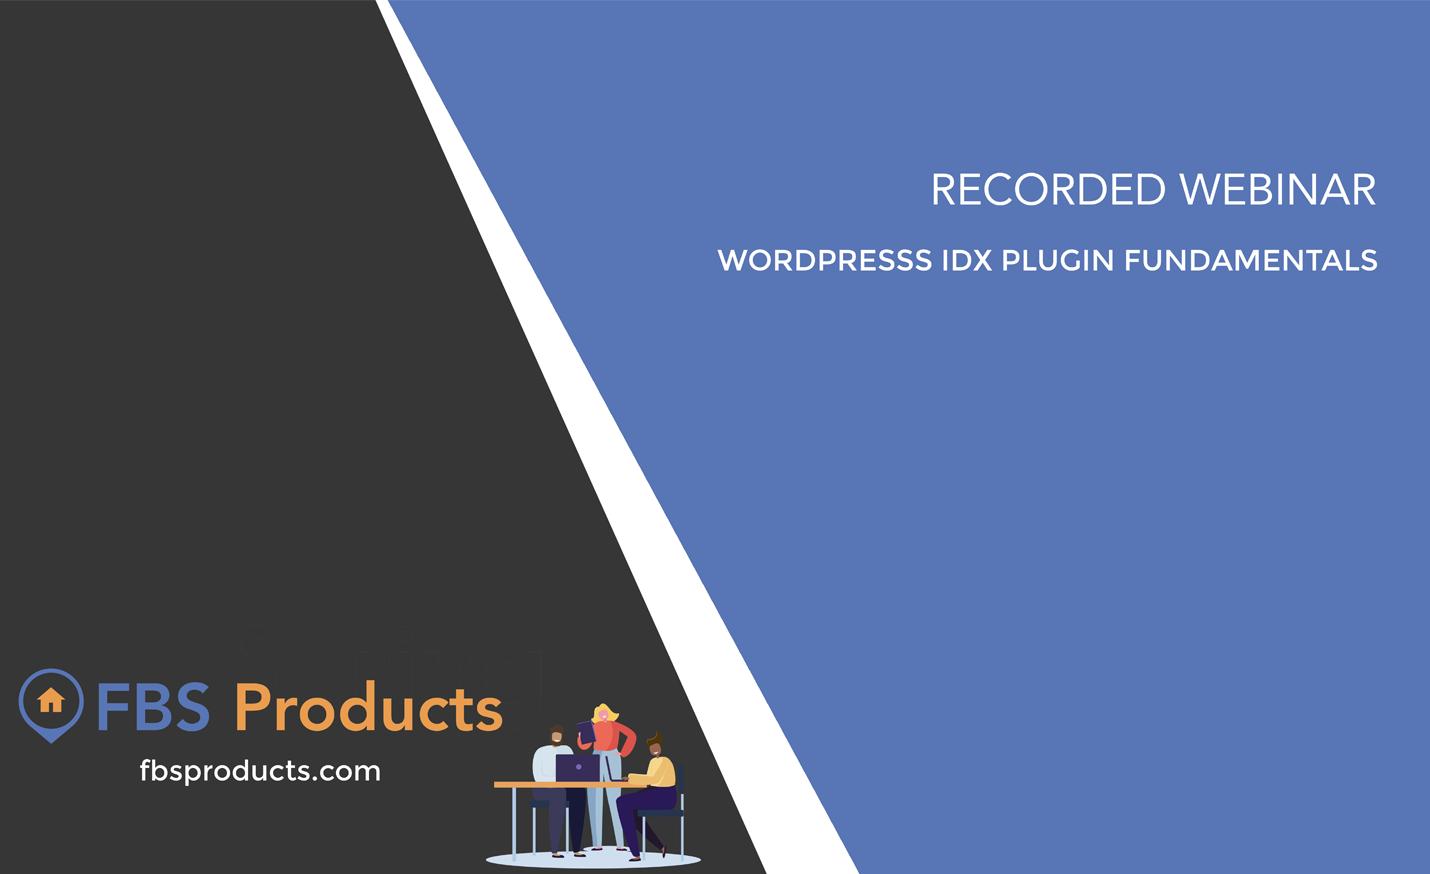 IDX Wordpress Plugin Fundamentals